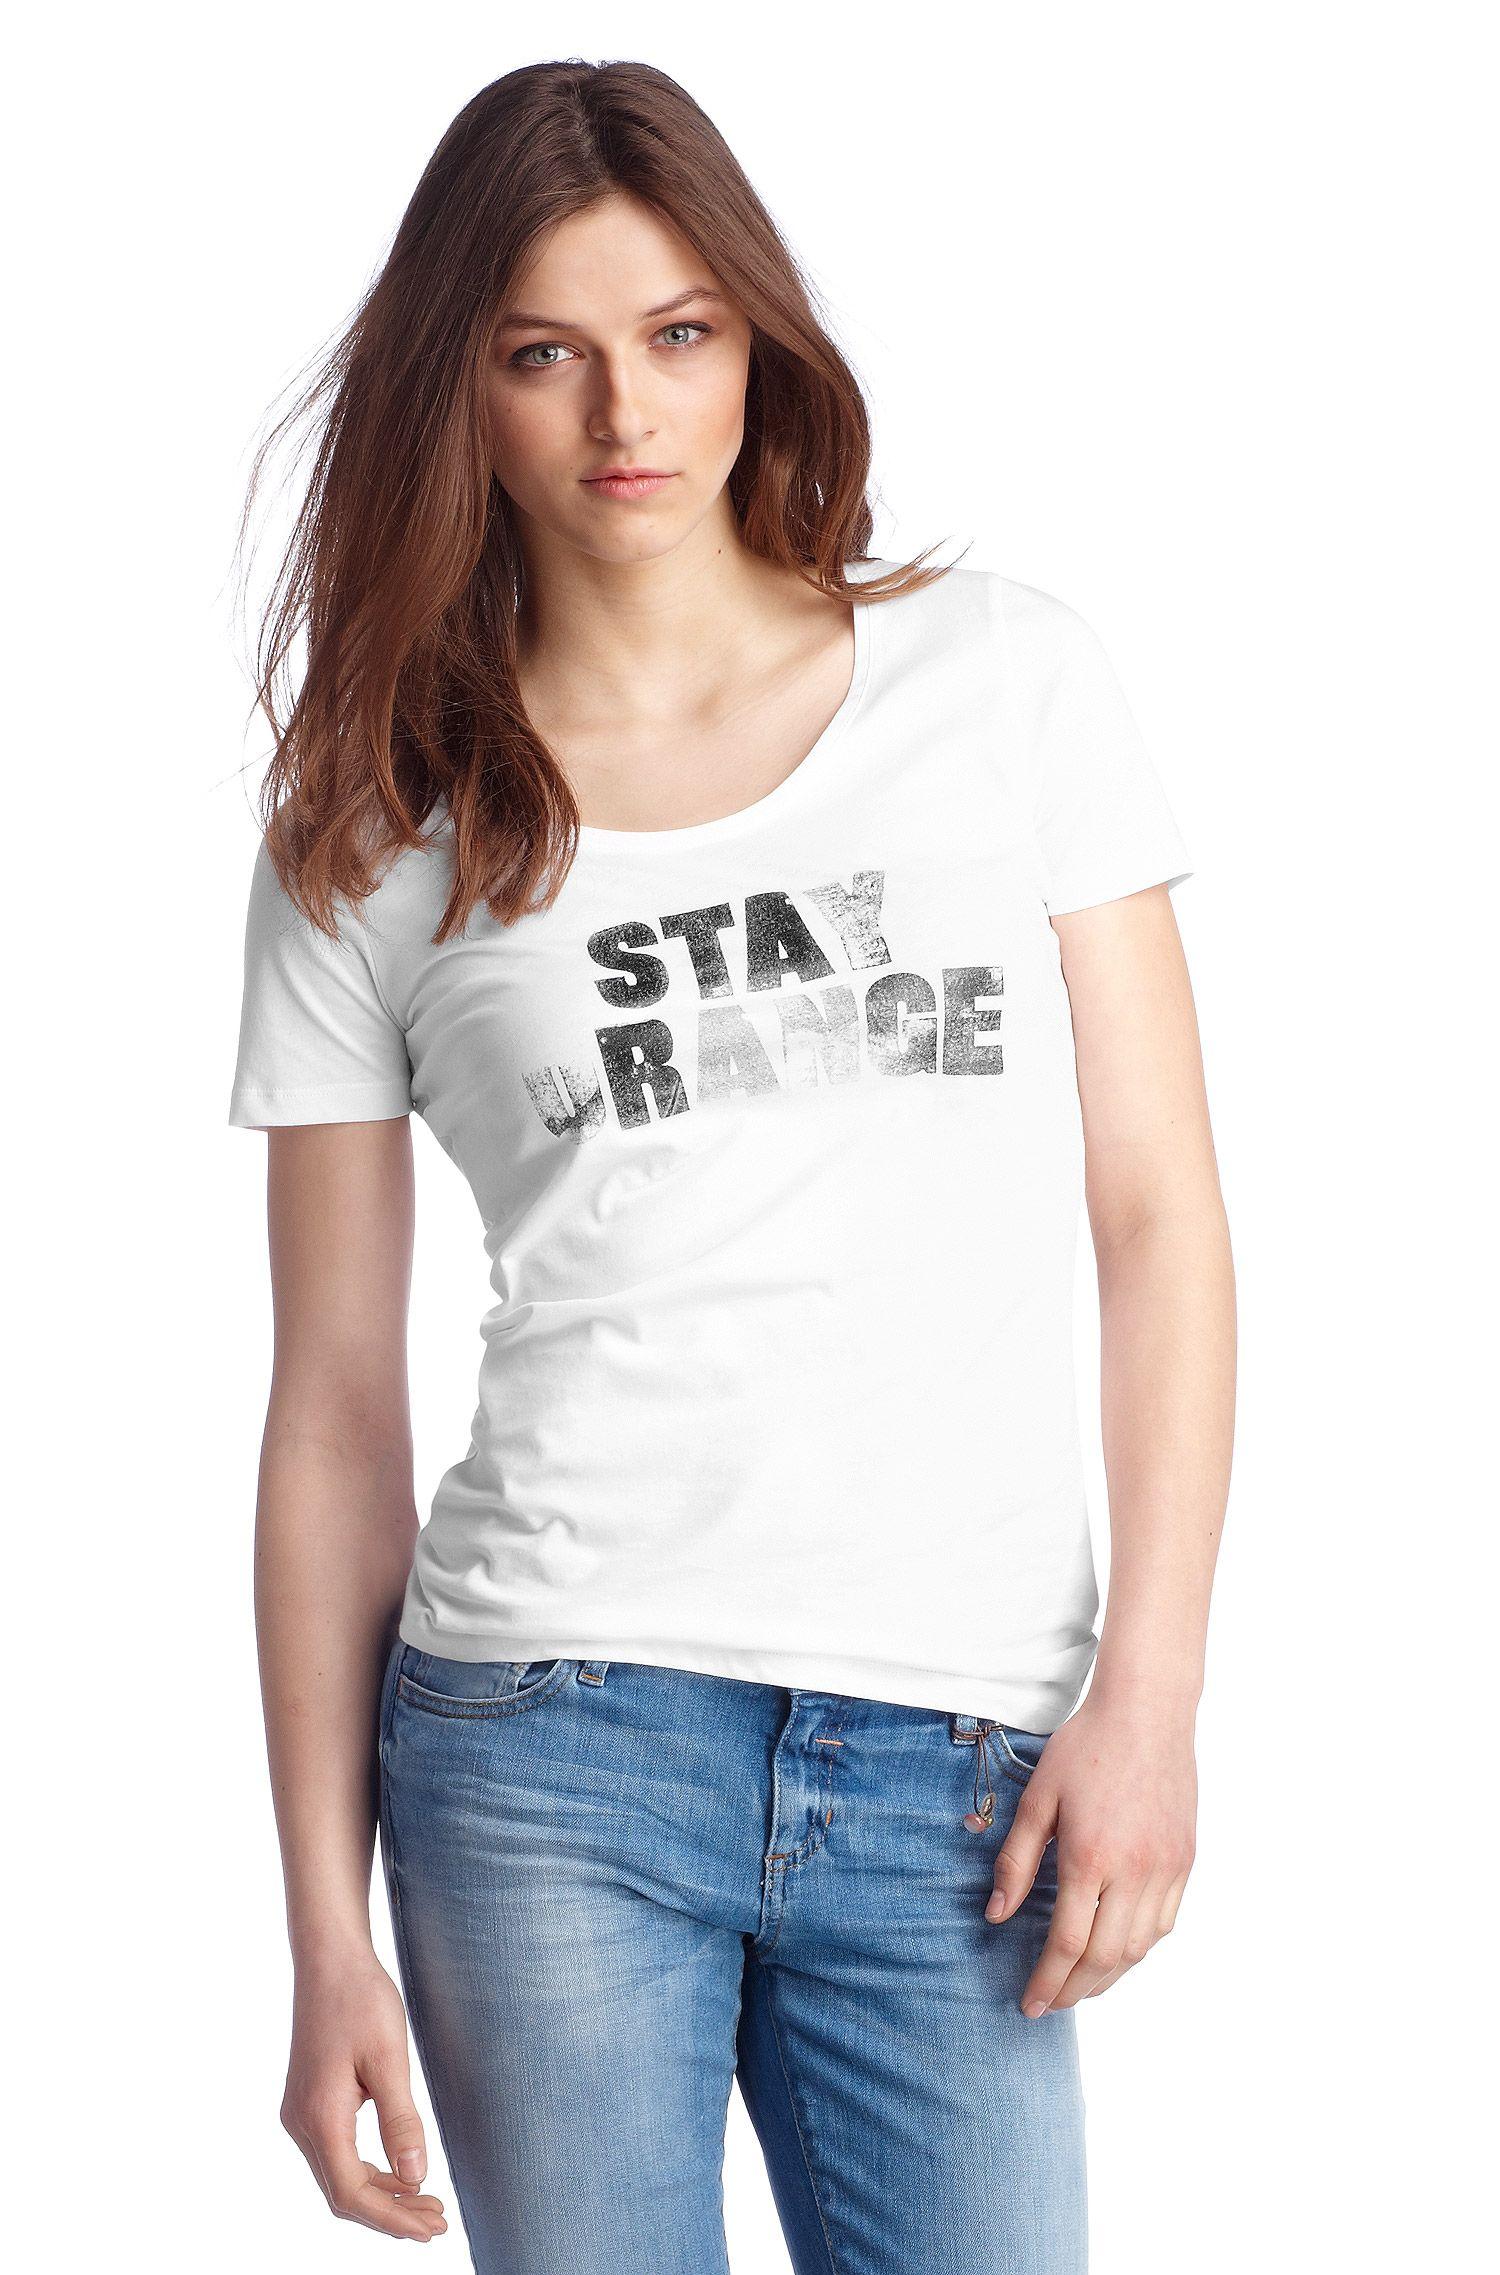 T-shirt à encolure ronde, Teasi